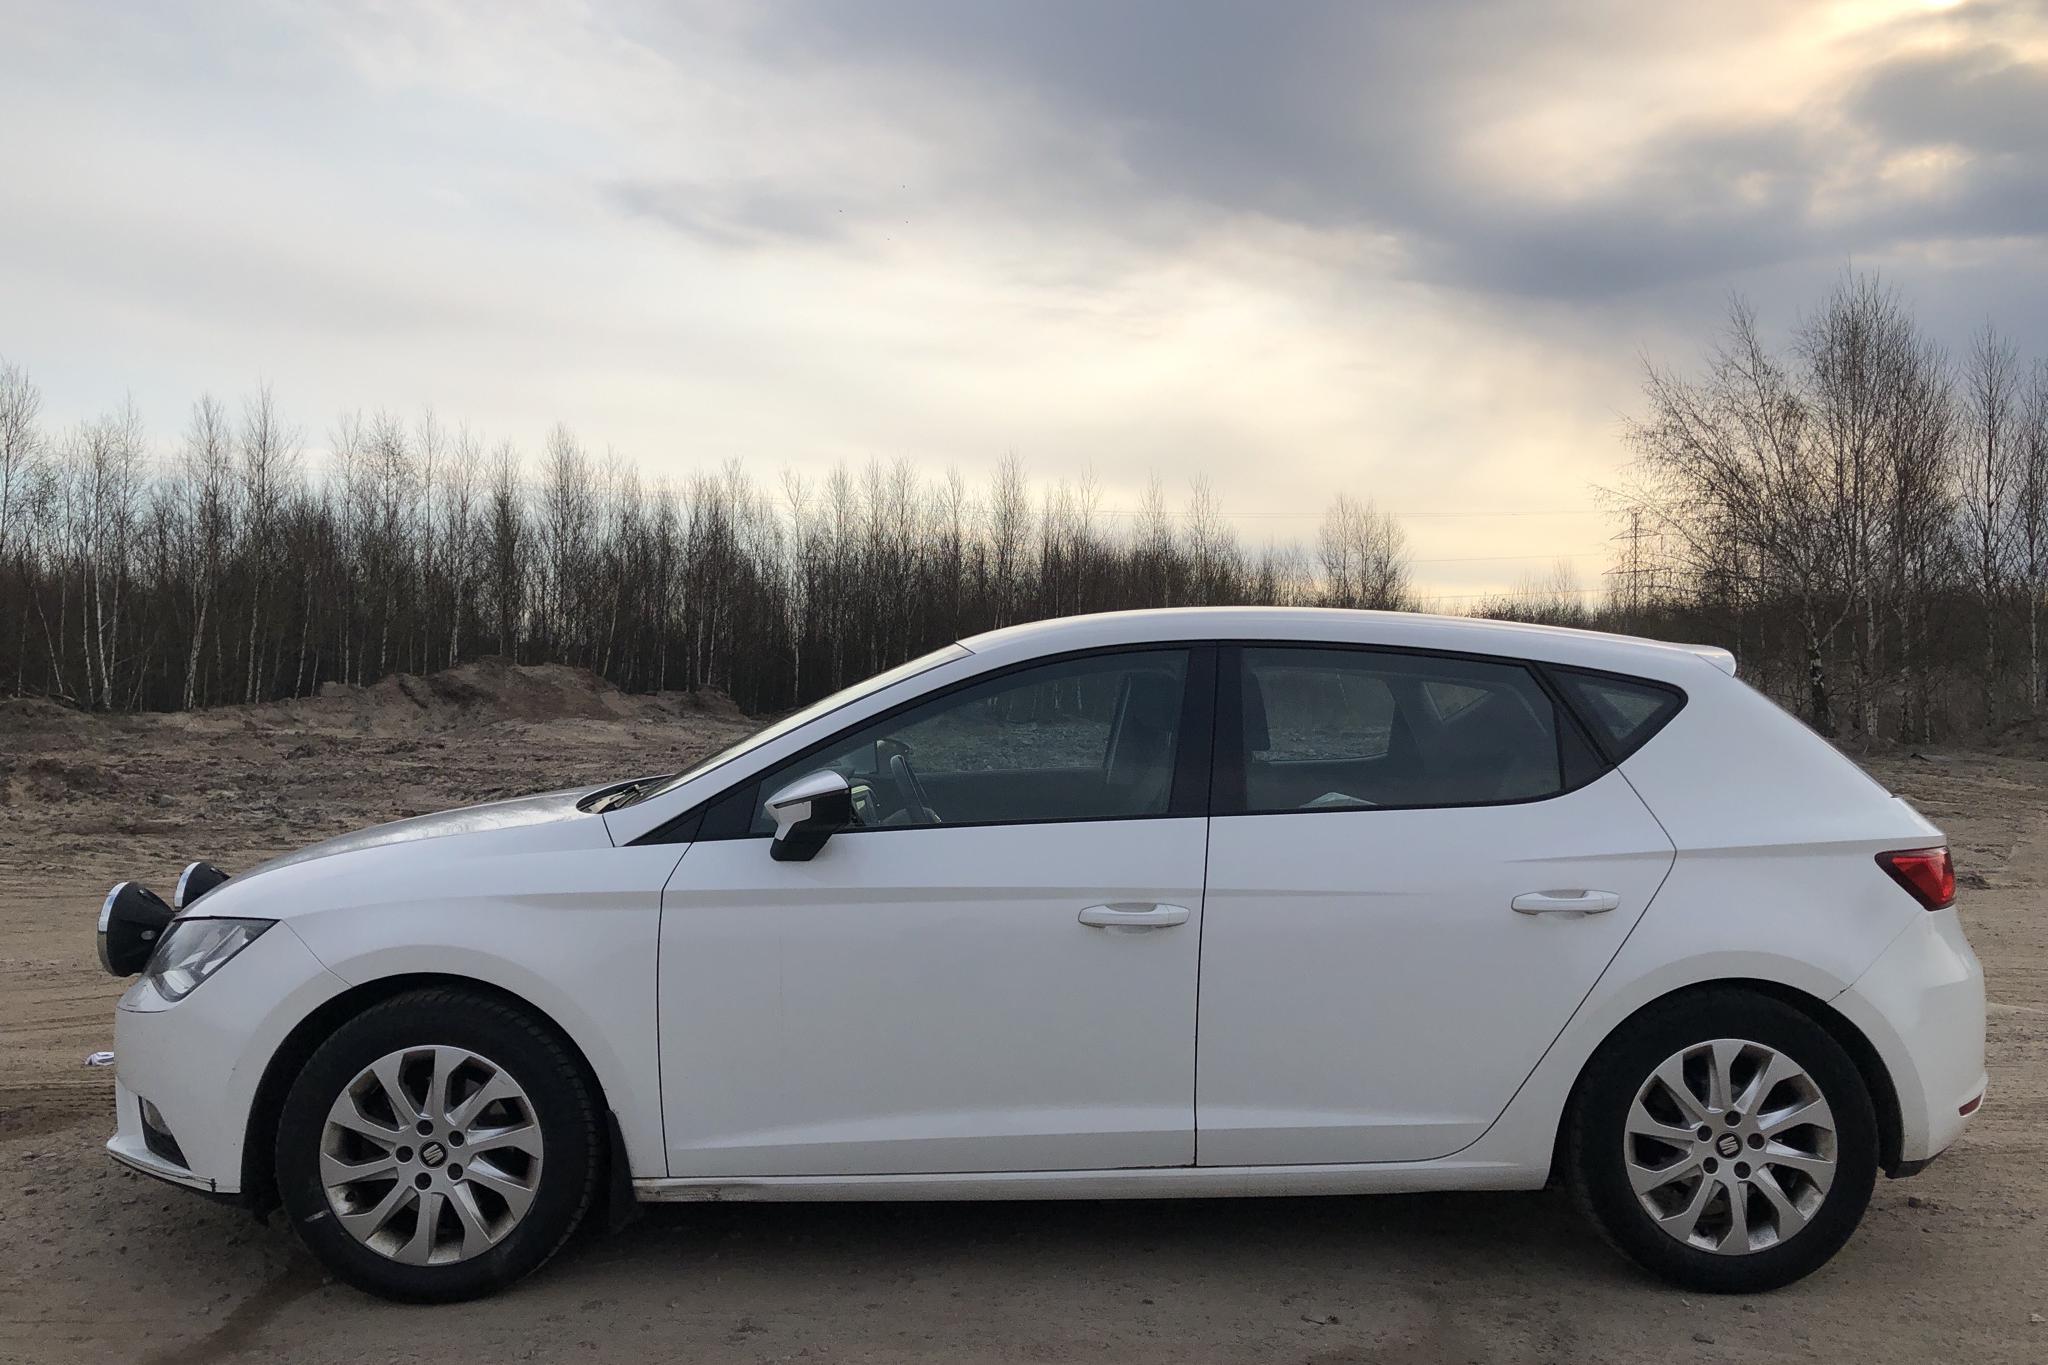 Seat Leon 1.4 TGI 5dr (110hk) - 181 170 km - Manual - white - 2016